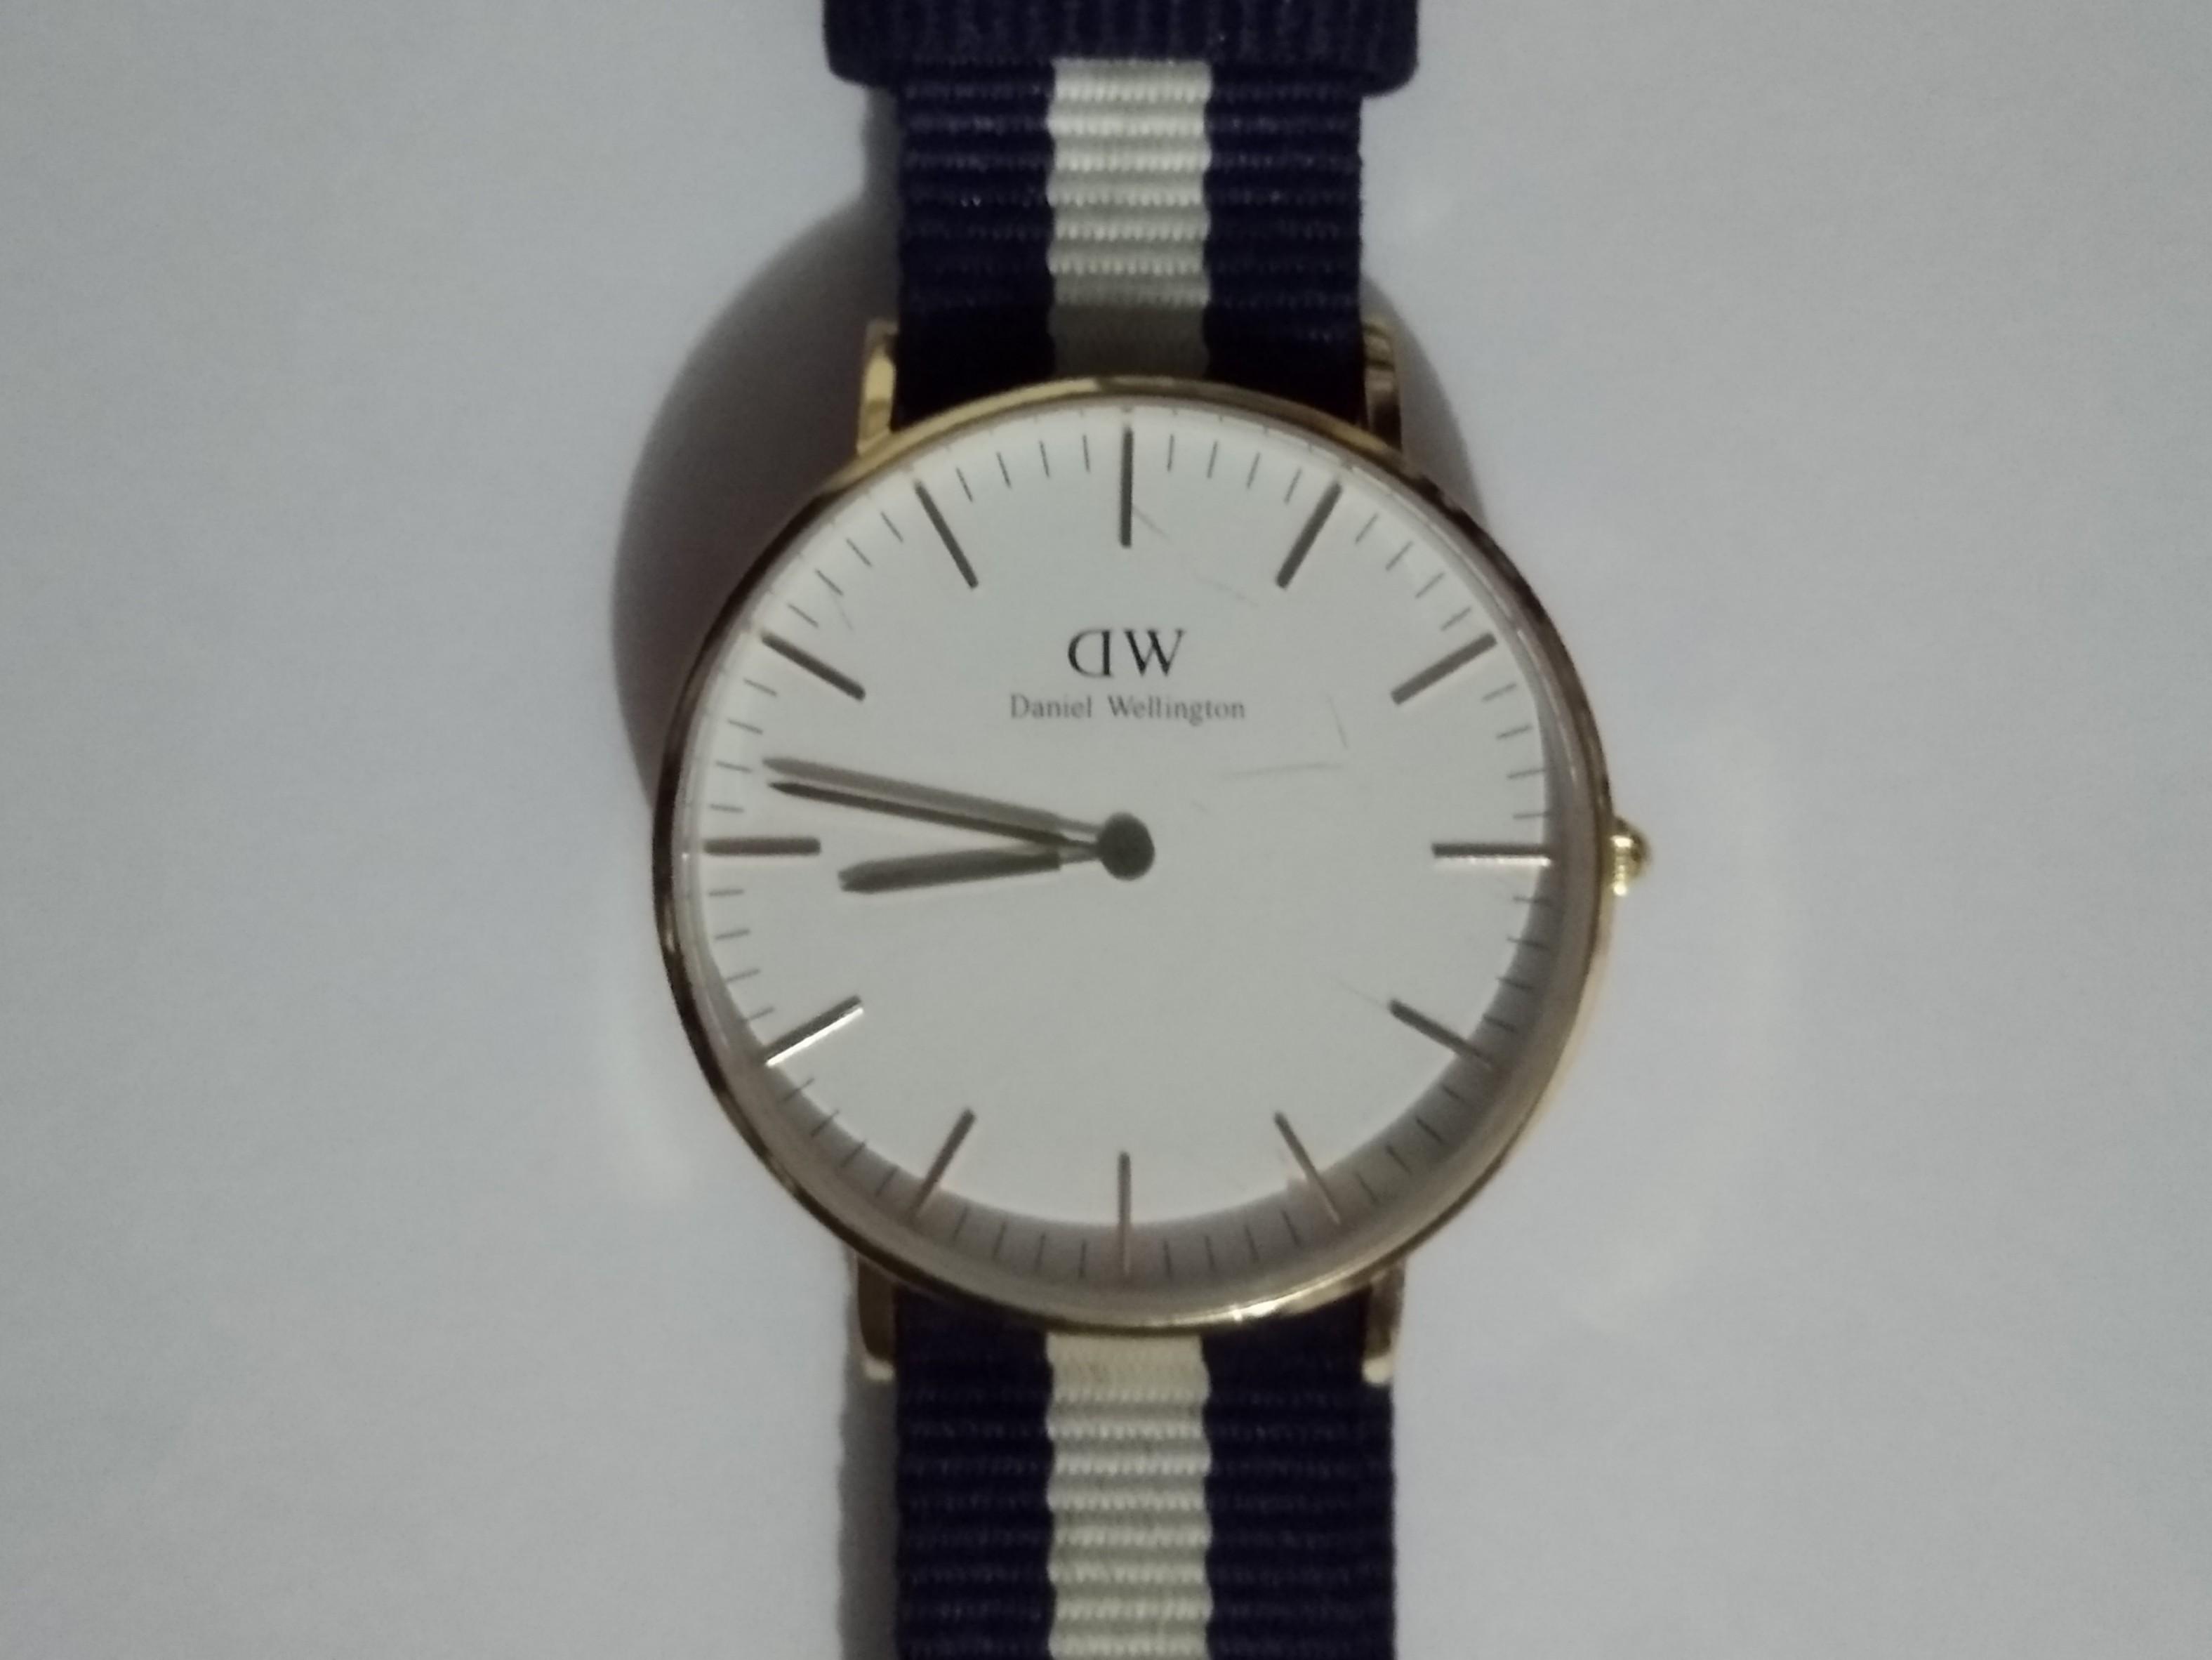 a8b9e50ef688e DW Daniel Wellington watch